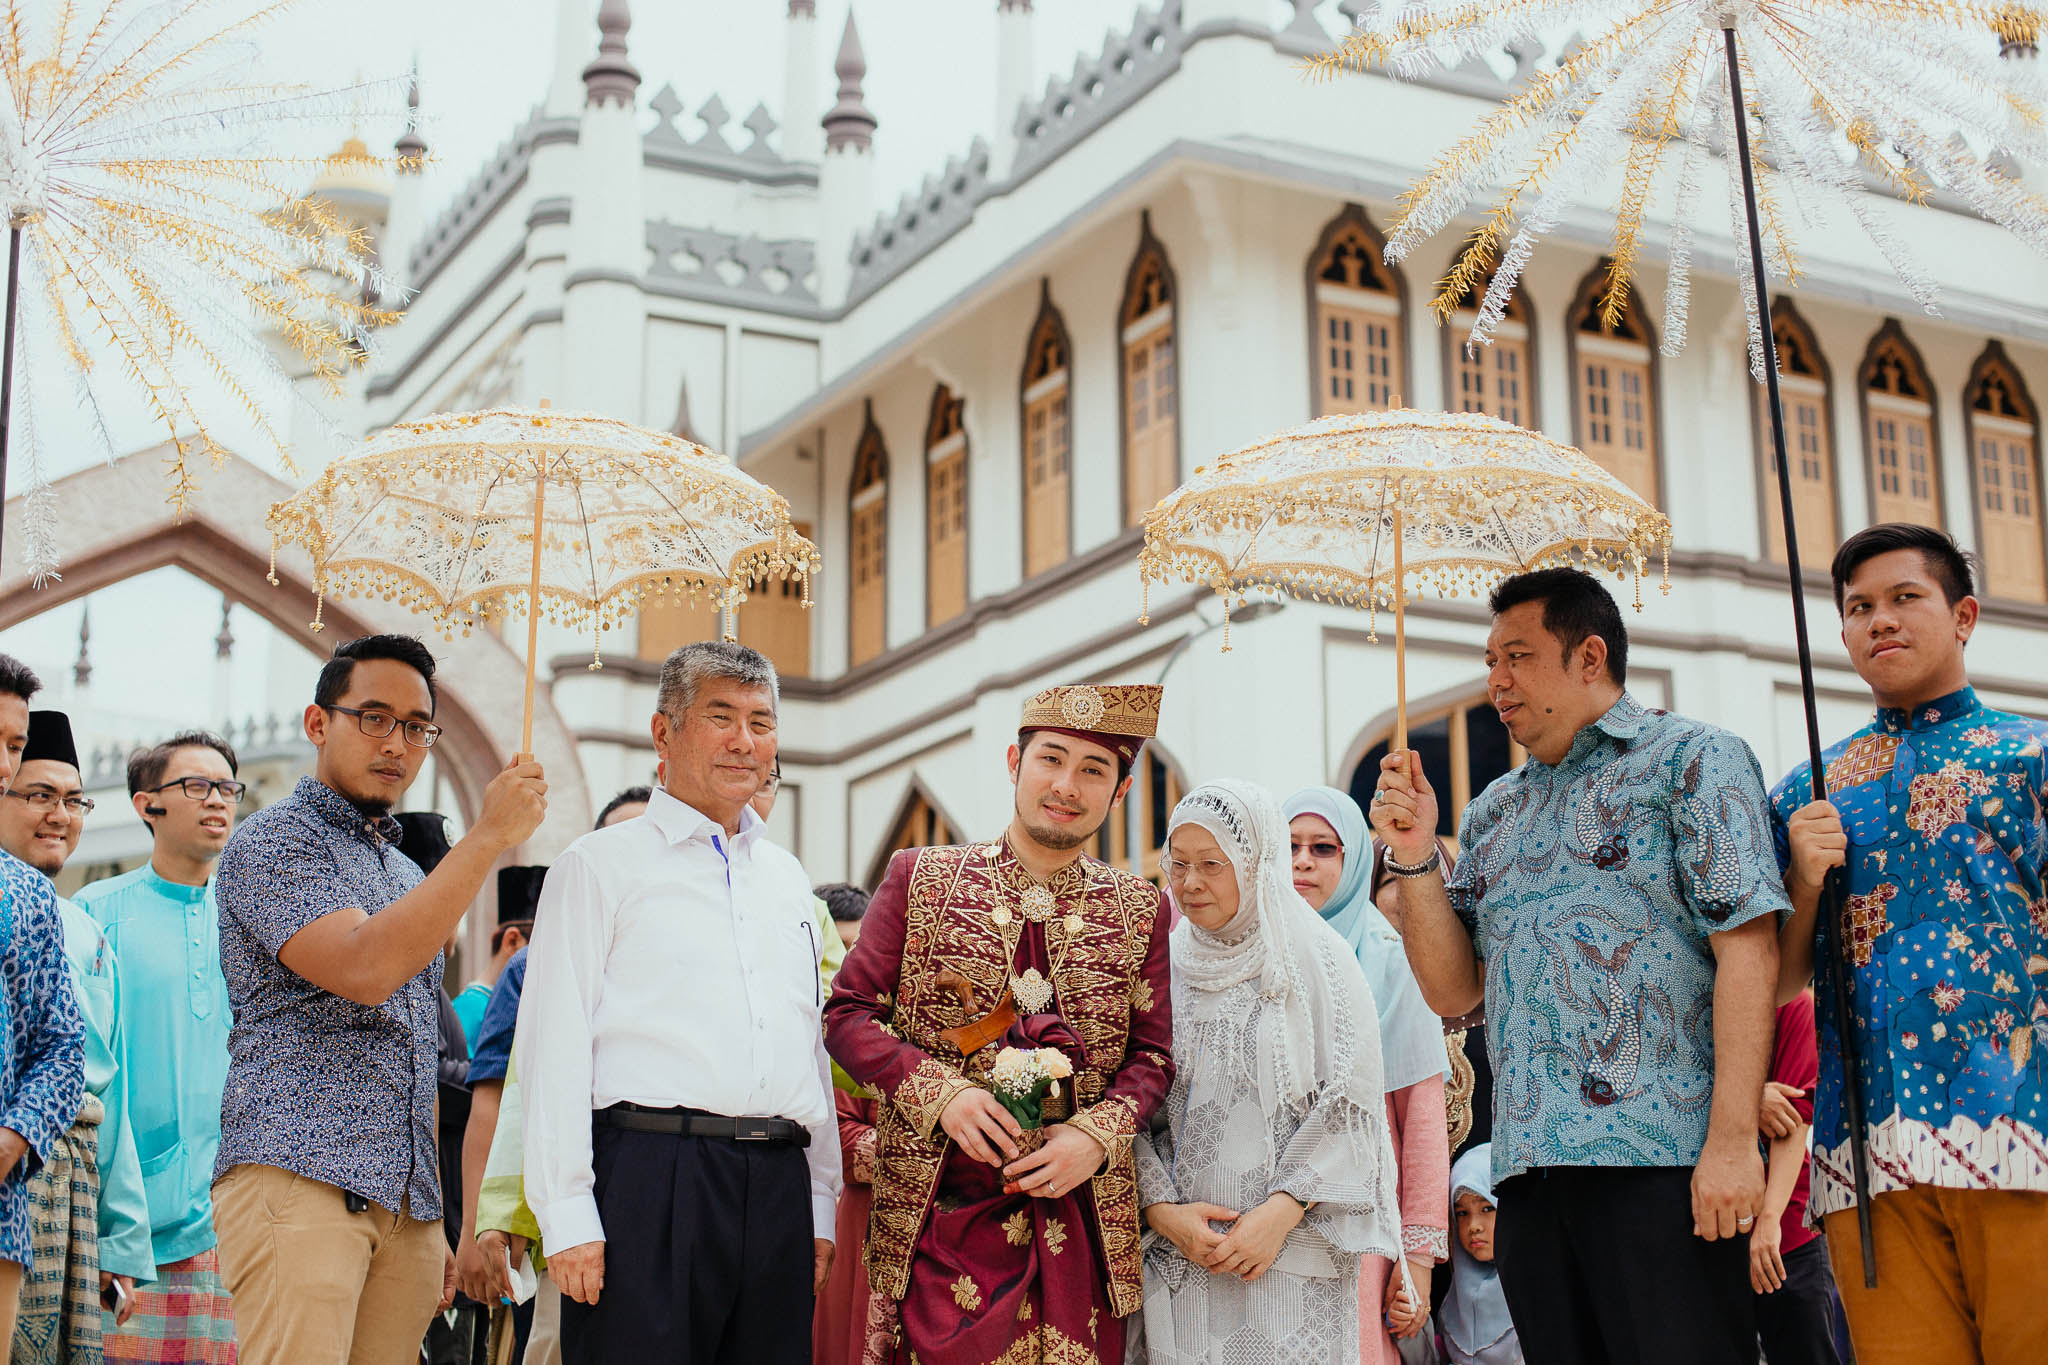 singapore-wedding-photographer-malay-indian-pre-wedding-travel-wmt-2015-22.jpg